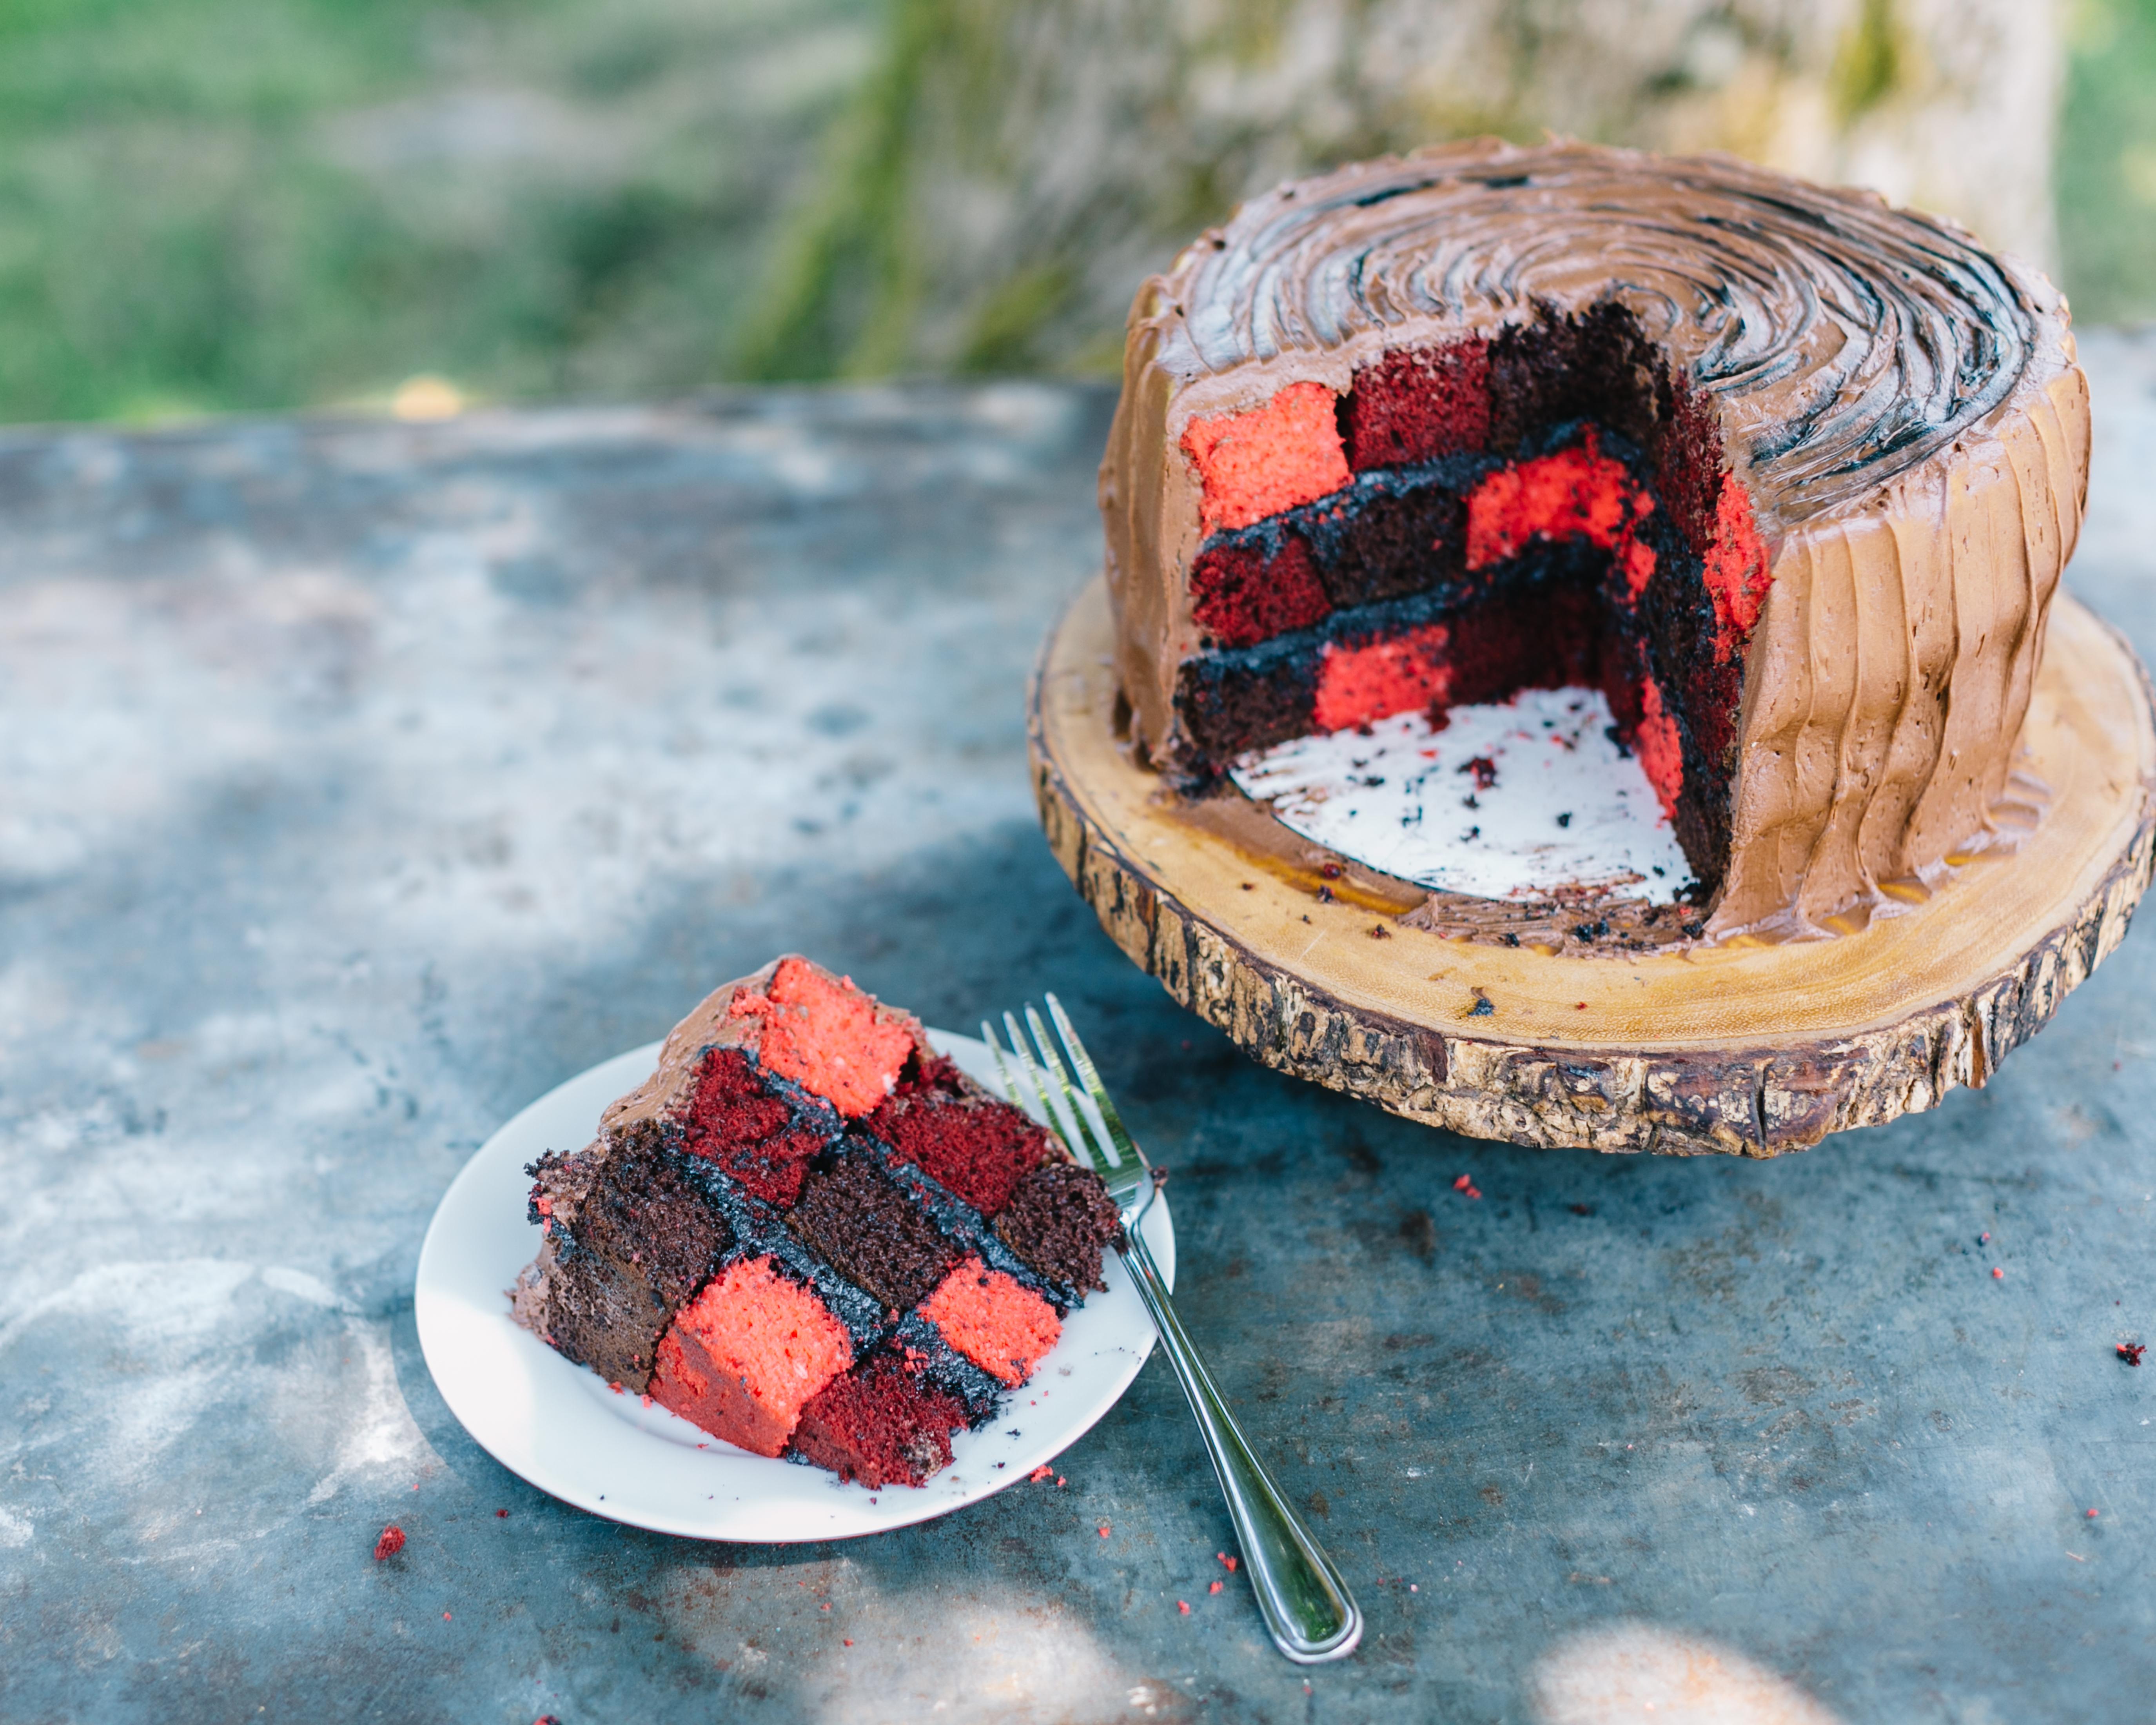 How to Make a Lumberjack Stump Cake